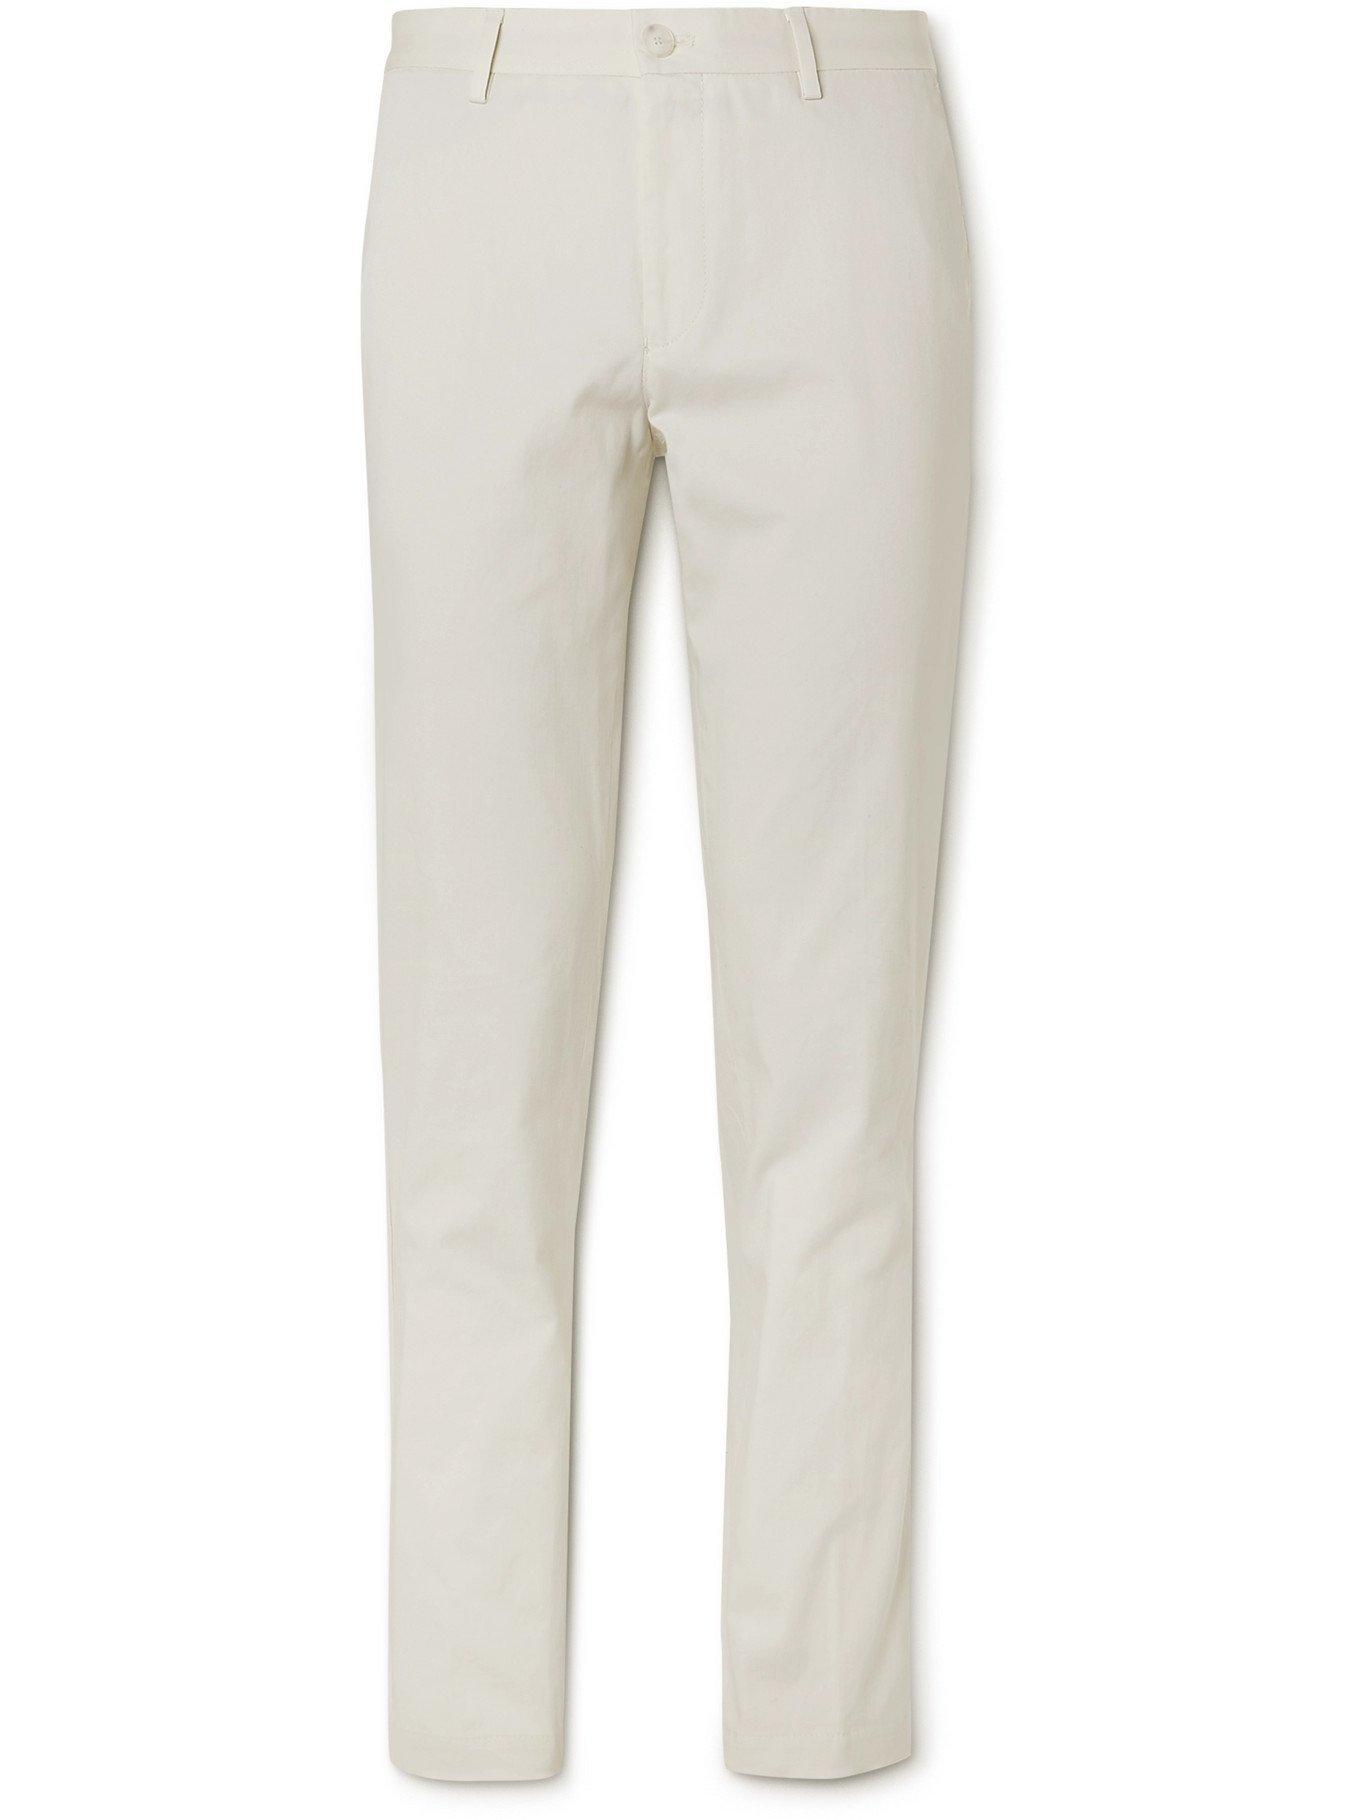 HUGO BOSS - Slim-Fit Cotton Trousers - Neutrals